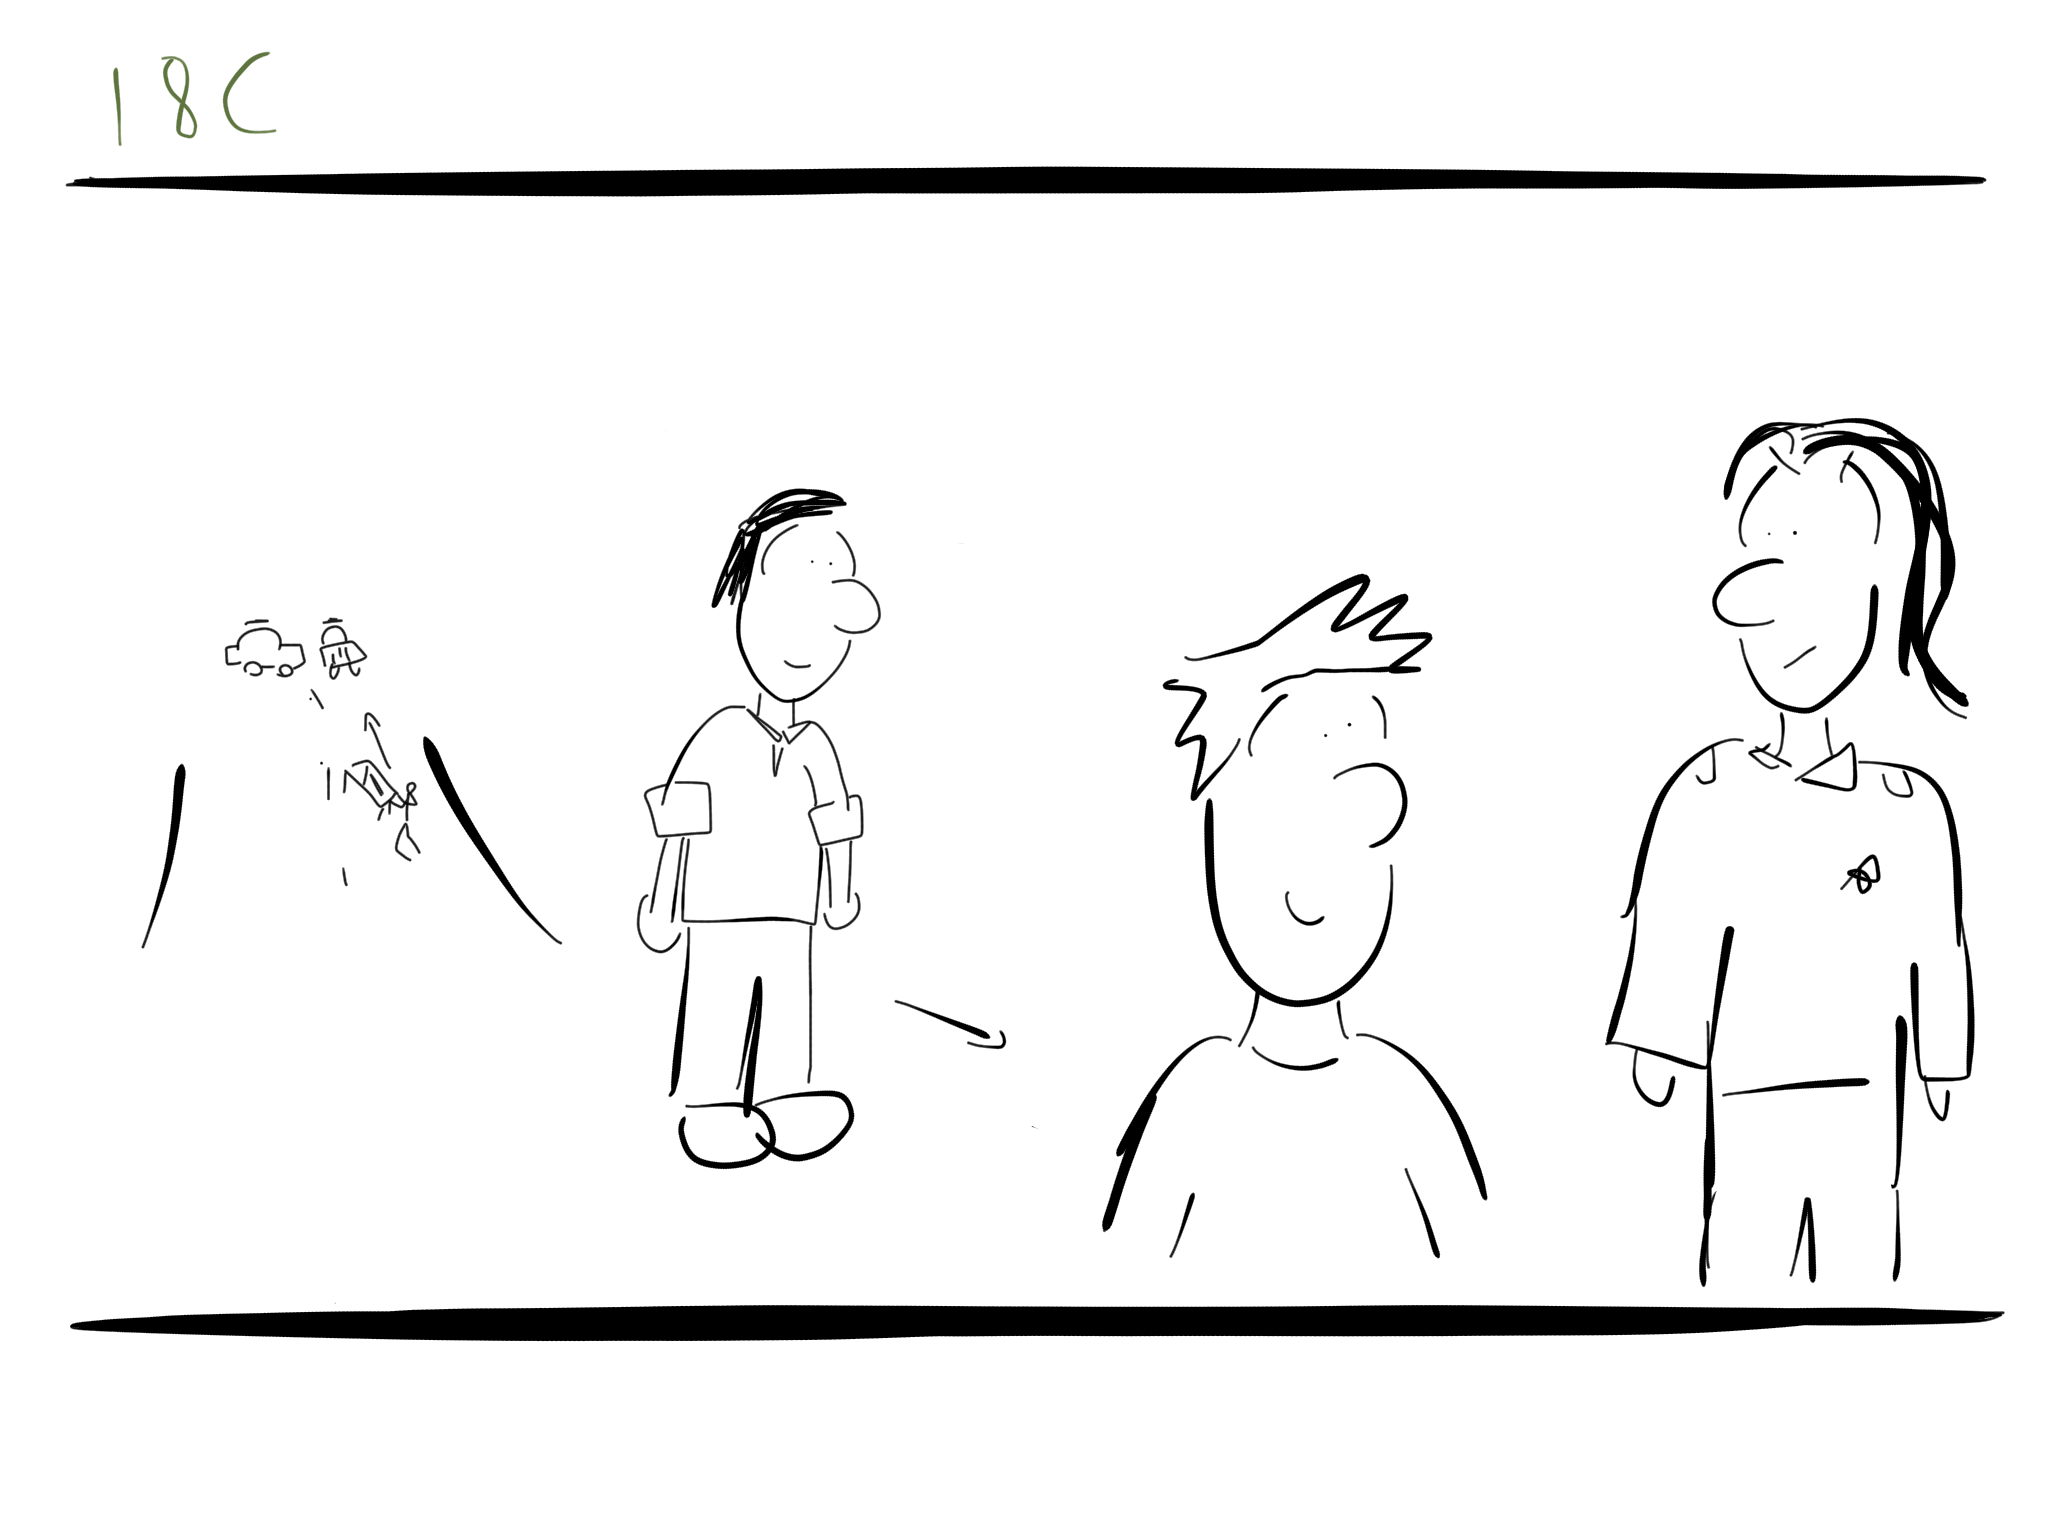 BDF_Storyboards_85.jpg